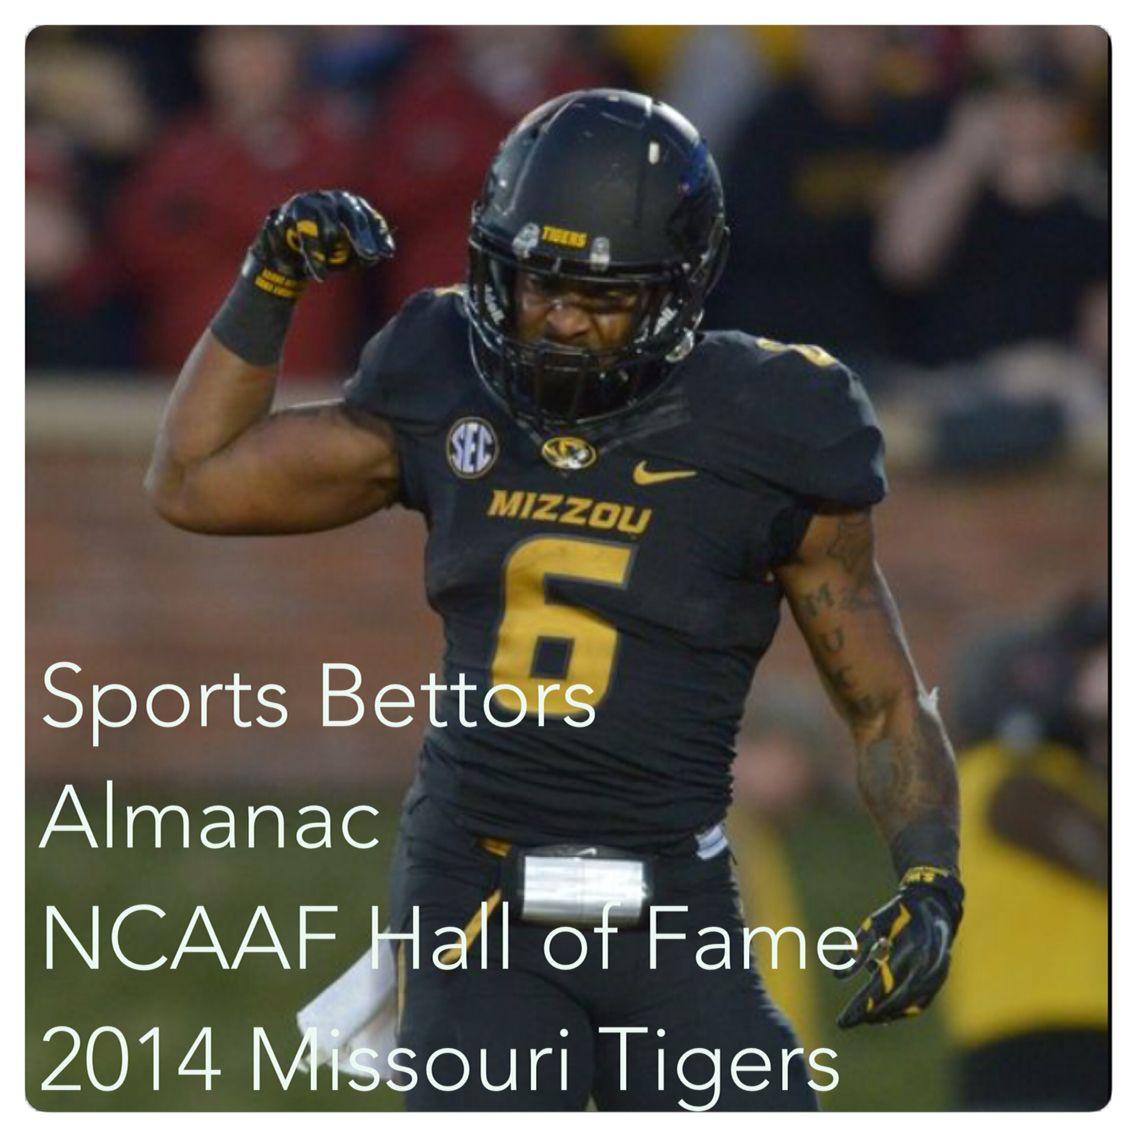 NCAAF Sports Bettors Almanac Hall Of Fame 2014 Missouri